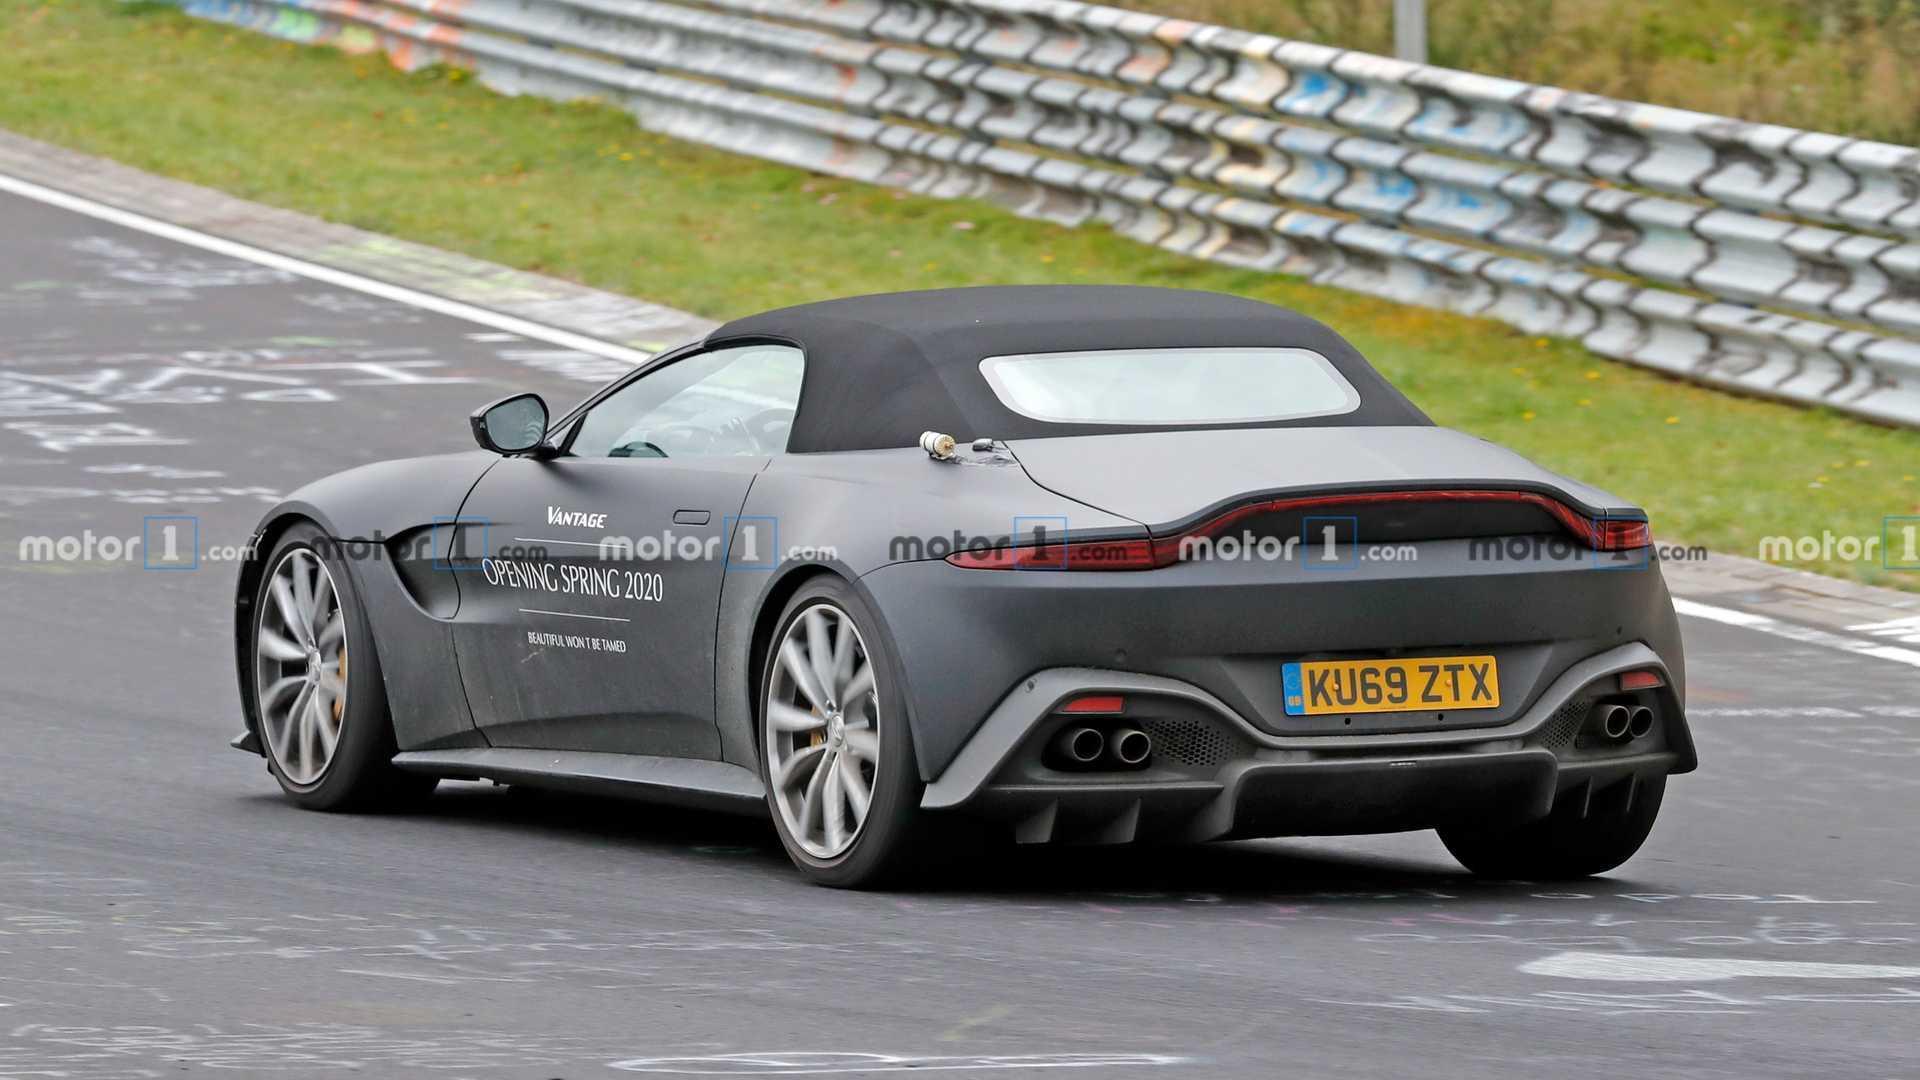 Aston Martin Vantage Roadster casuslara yakalandı